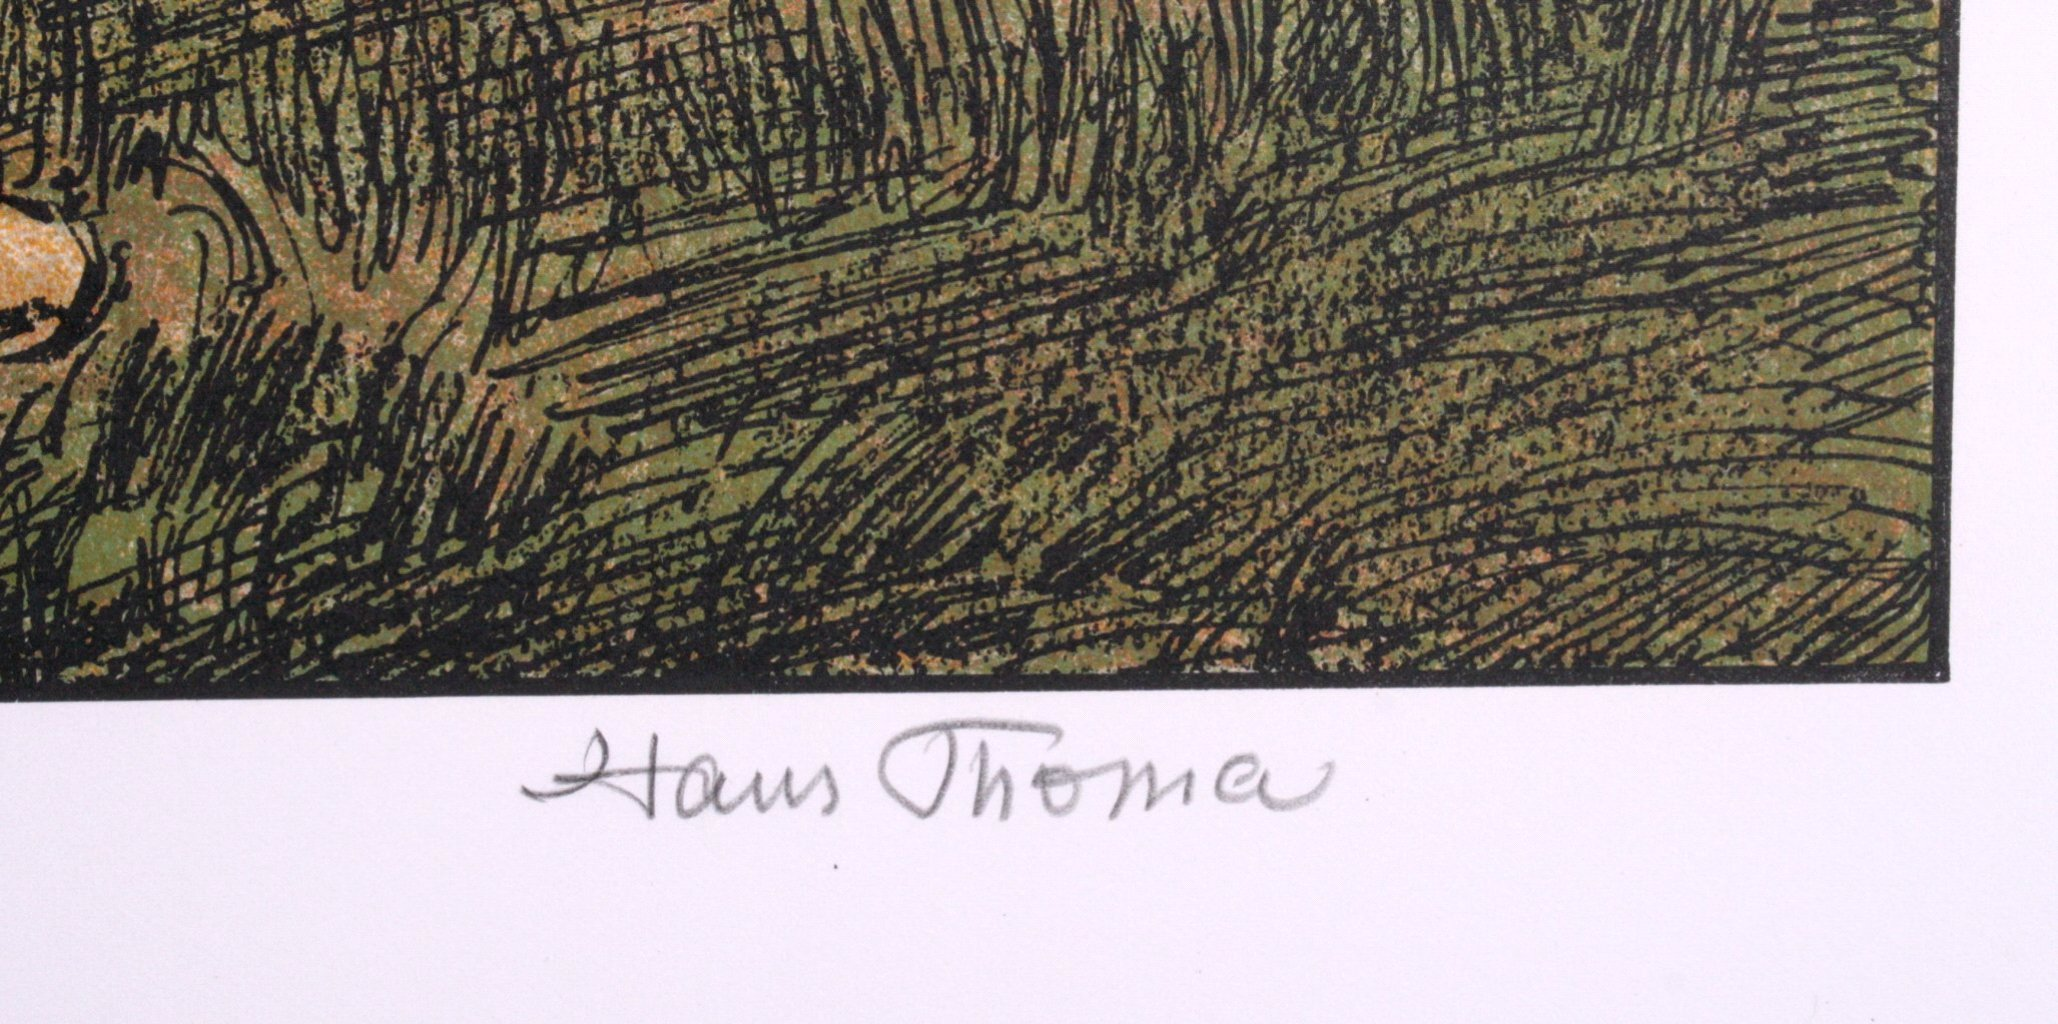 Hans Thoma 1839-1924. St. Anton bei Partenkirchen (1906)-2